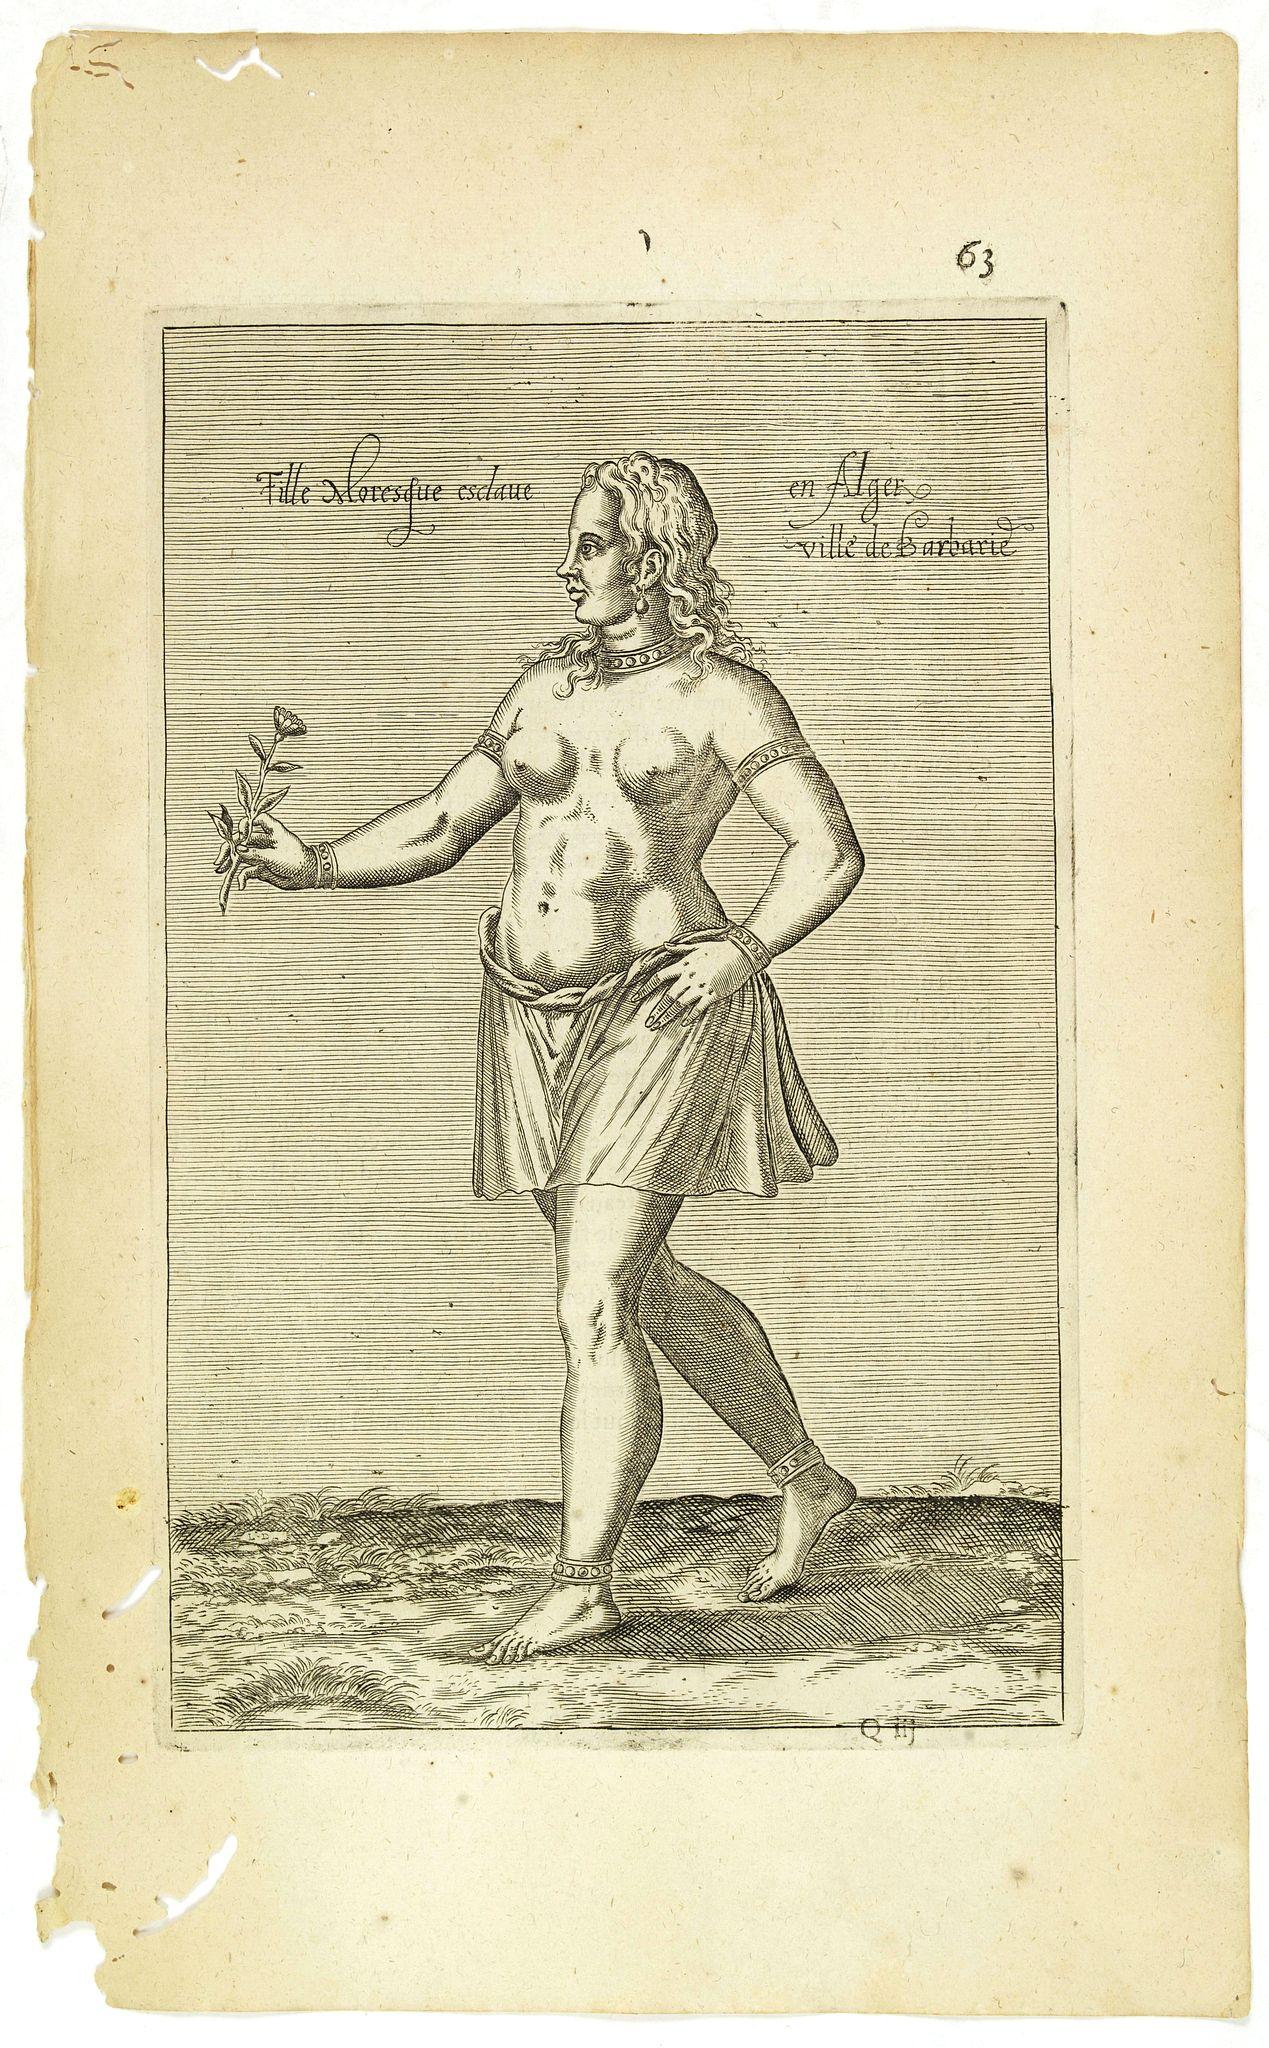 NICOLAS DE NICOLAY, Thomas Artus (sieur d'Embry). -  Fille Moresque esclave en Alger ville de Barbarie. (63)